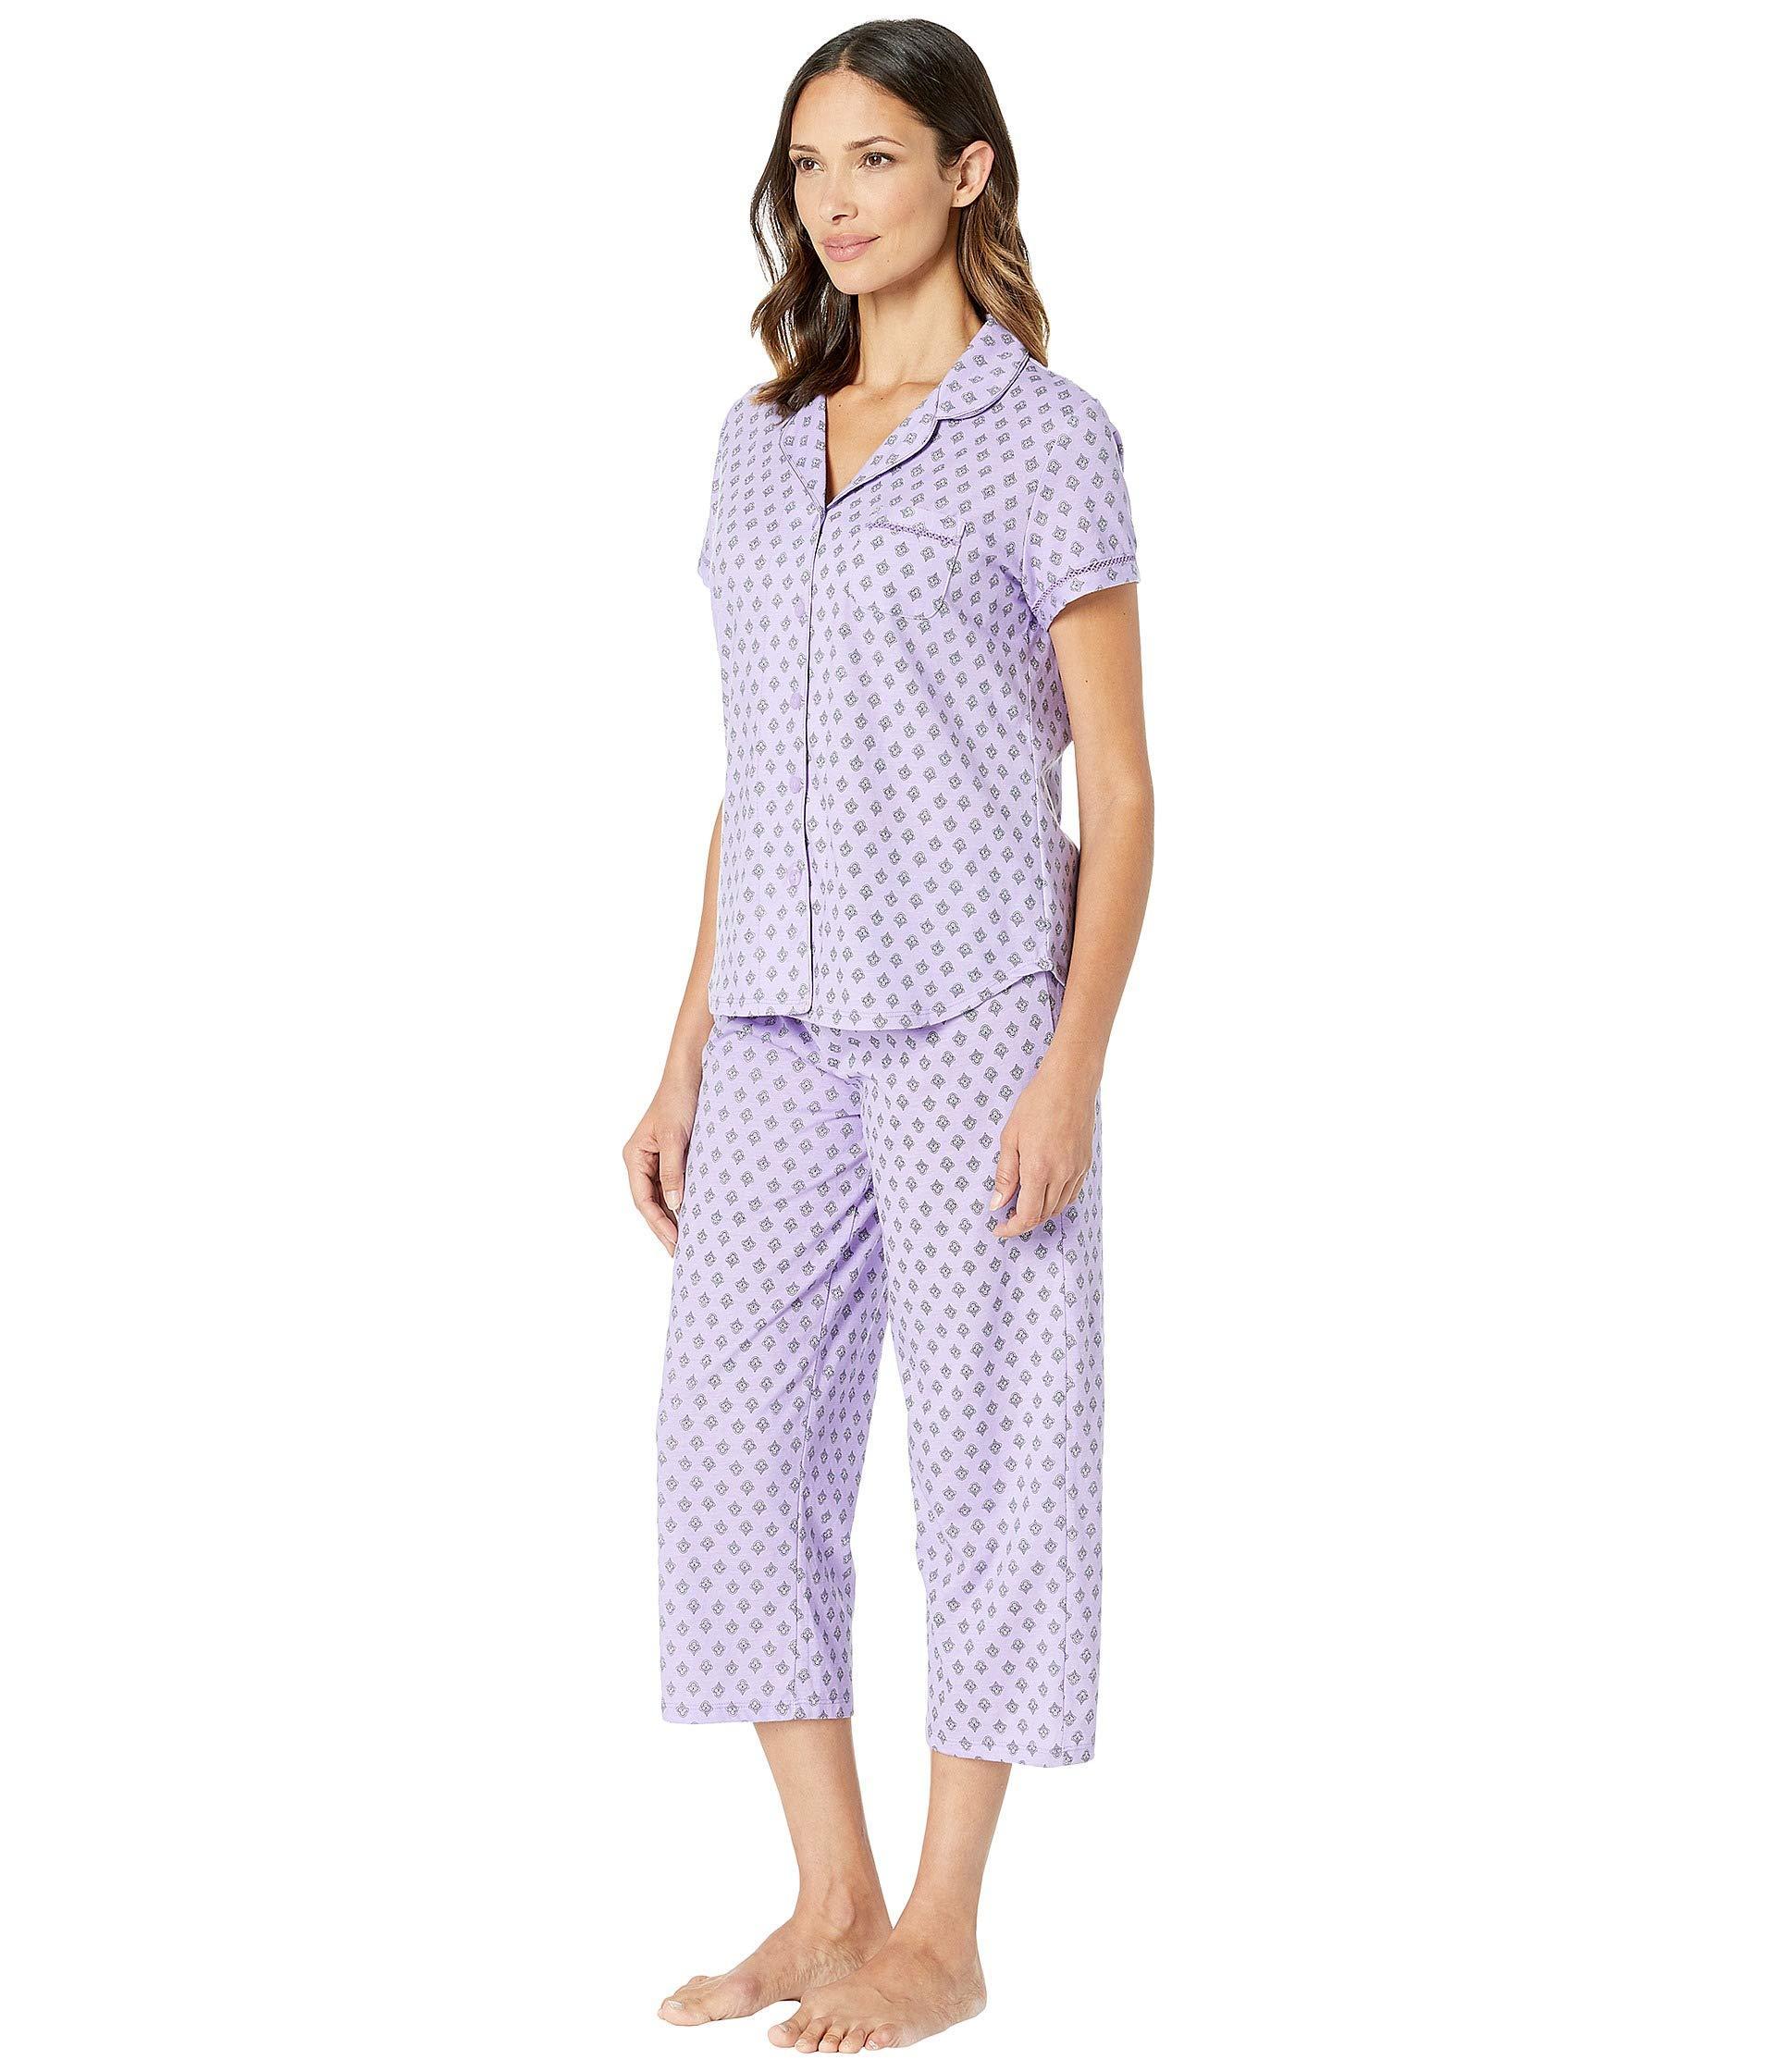 7e00a160e405 Lyst - Karen Neuburger Cloud Nine Short Sleeve Girlfriend Capris Pj  (floral mint) Women s Pajama Sets in Purple